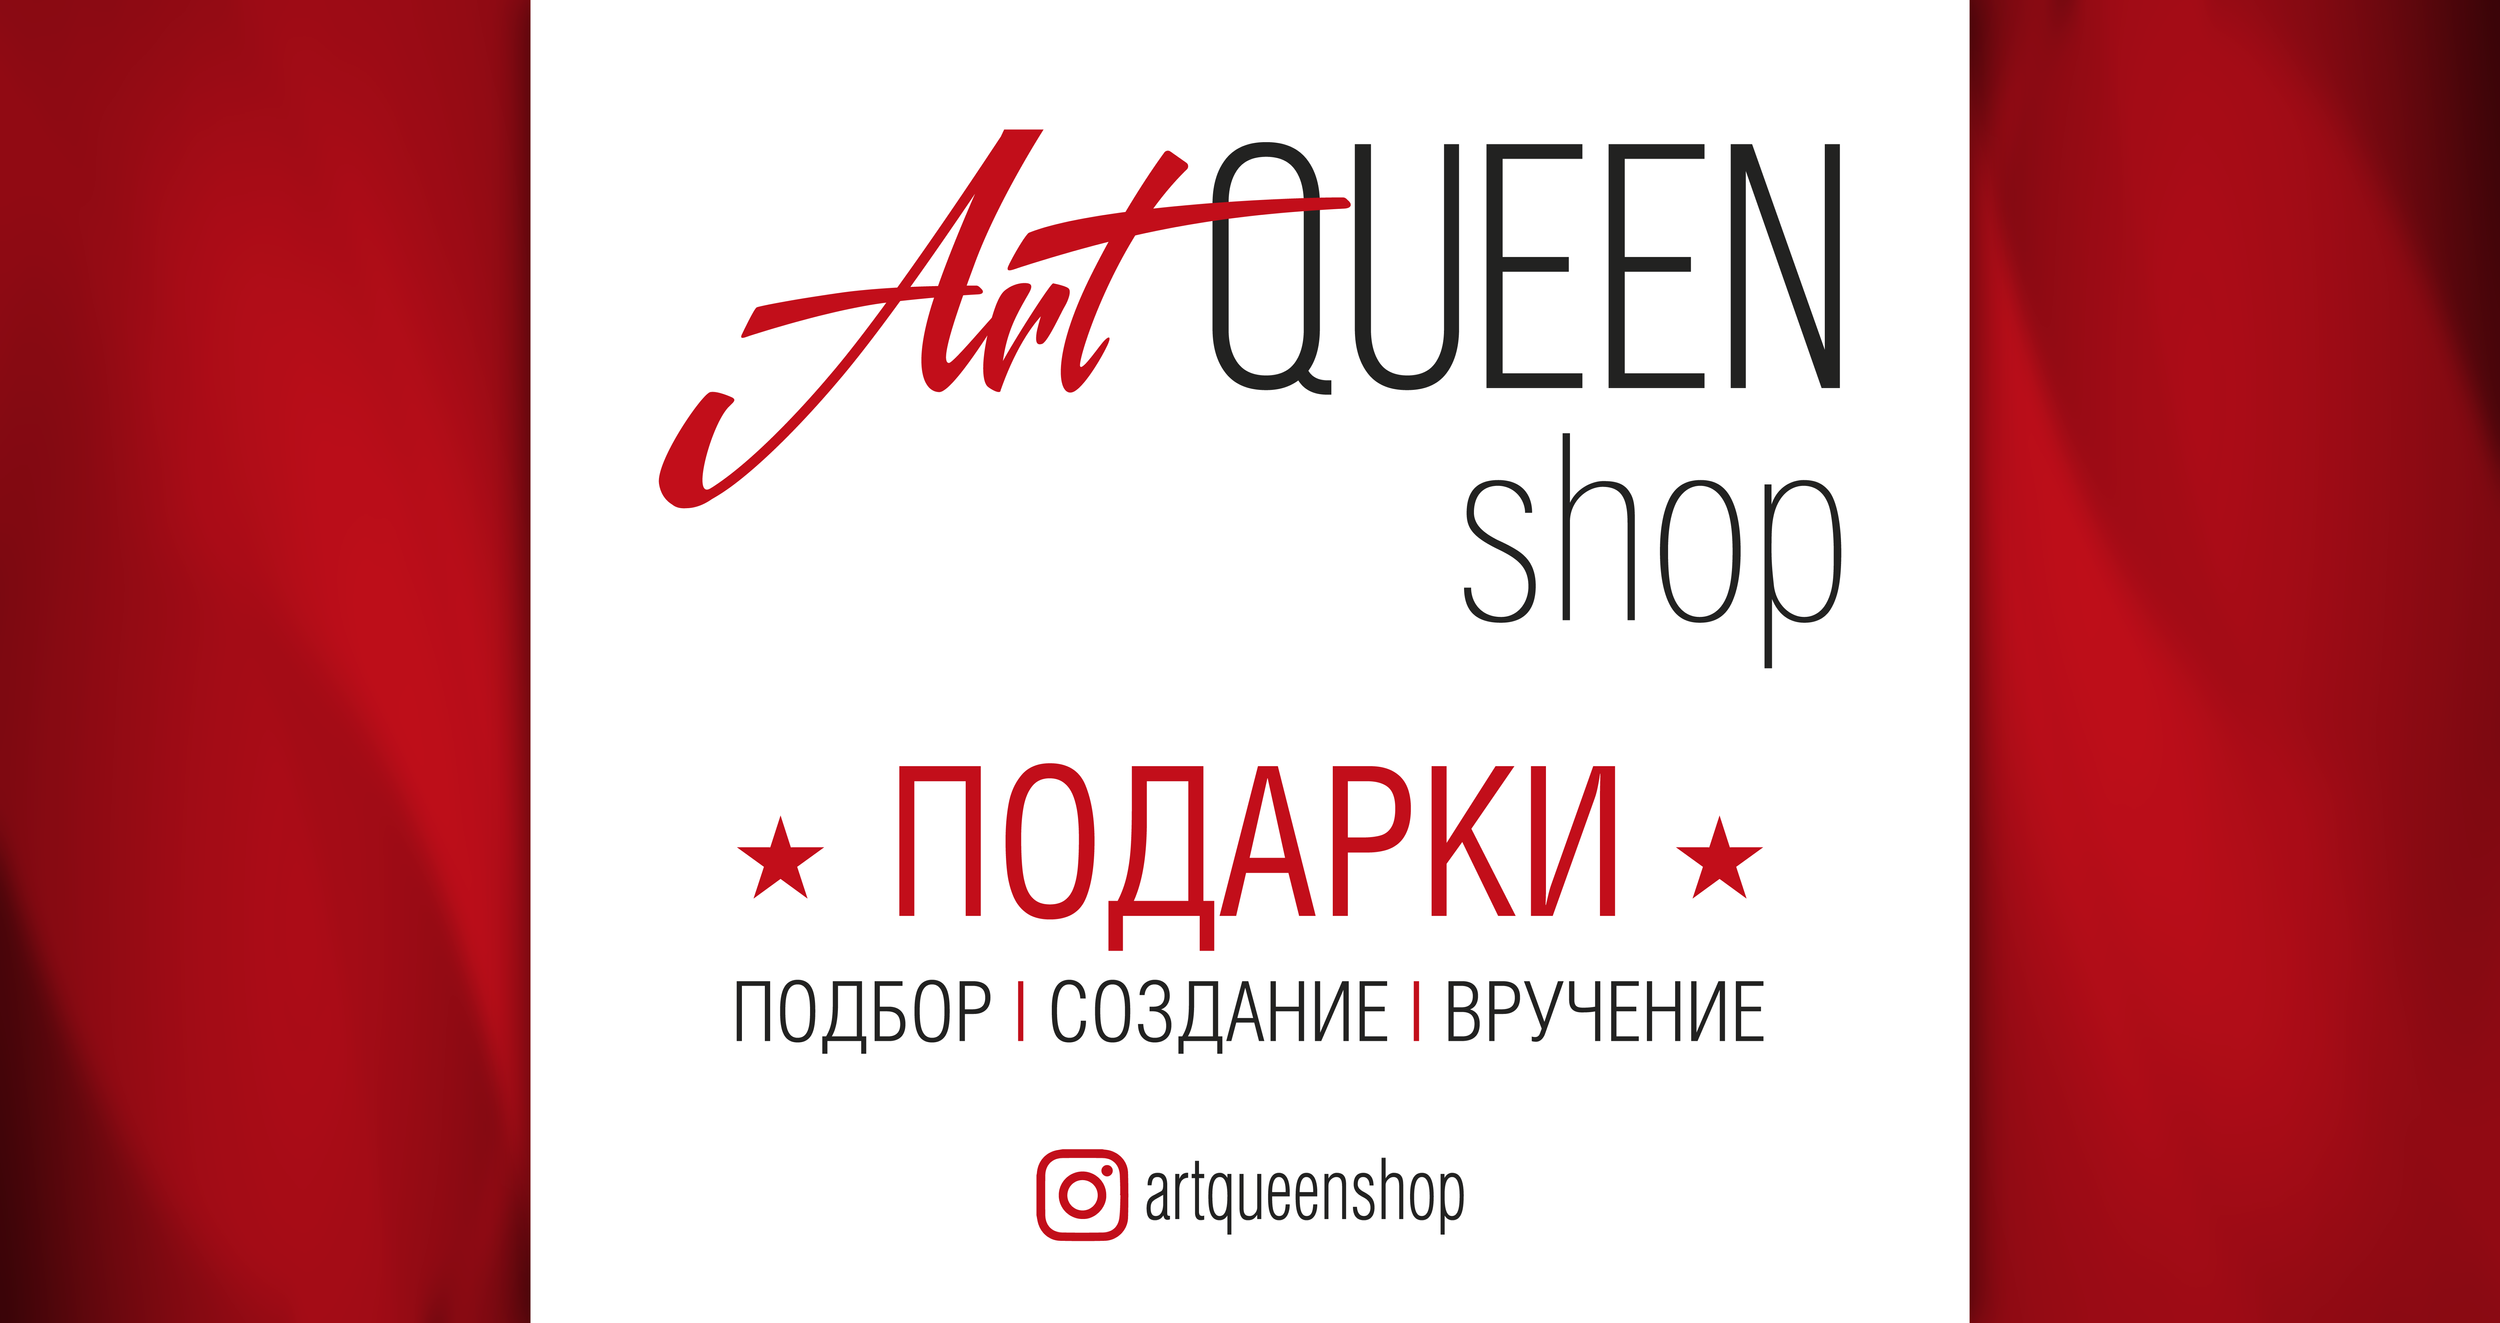 (c) Artqueen.ru